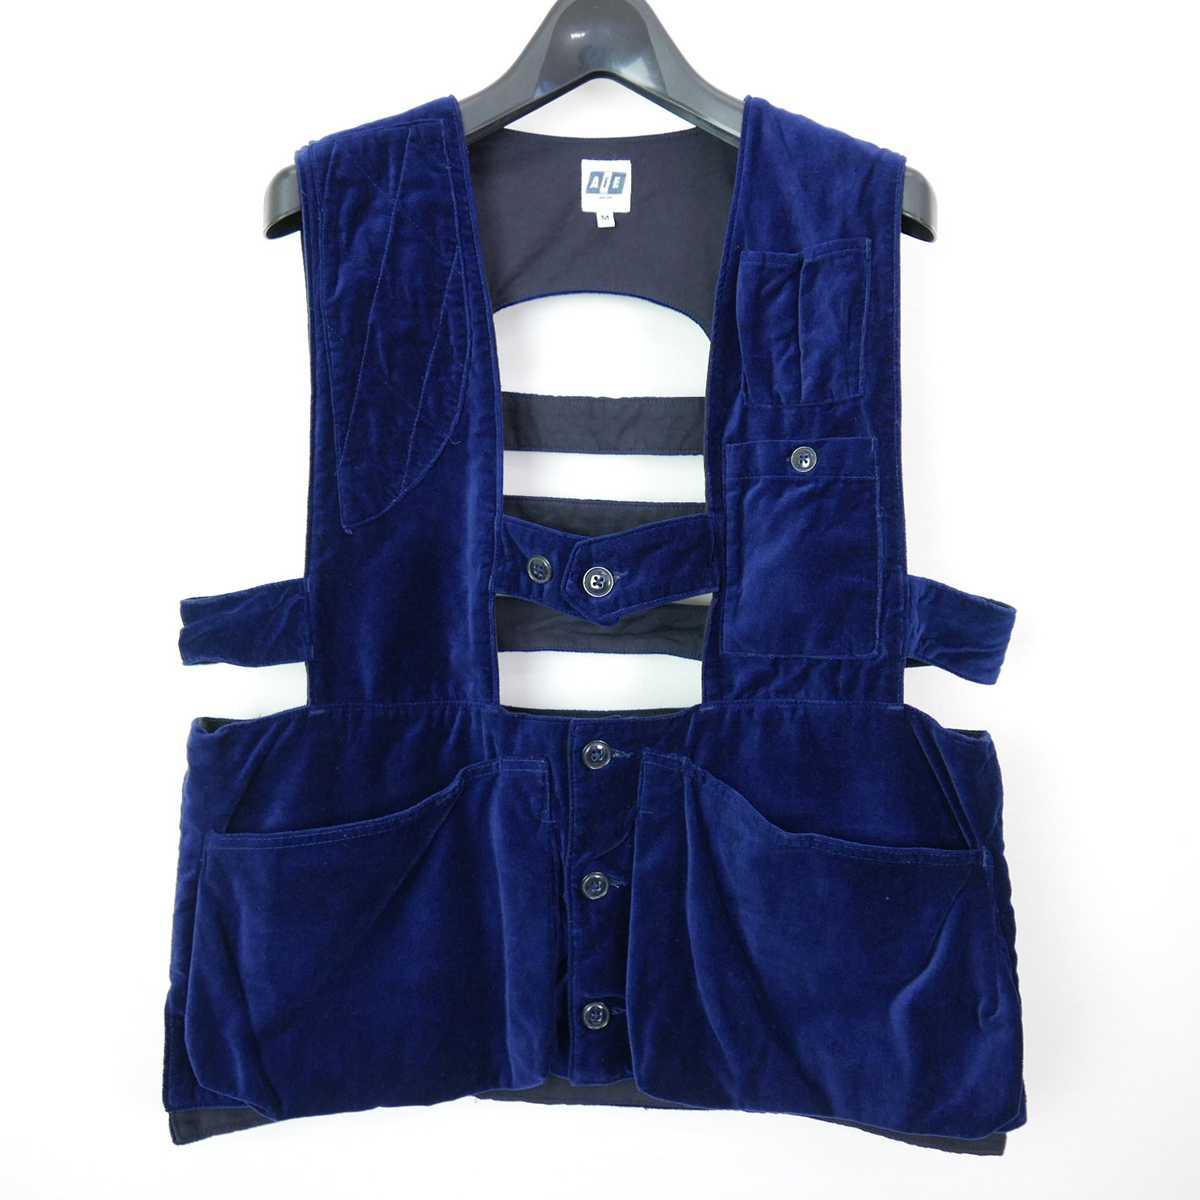 17AW 17FW AiE エーアイイー Game Vest - Cotton Velveteen コットン ベロア ゲーム ベスト ジレ NAVY M 【中古】 DN-11583